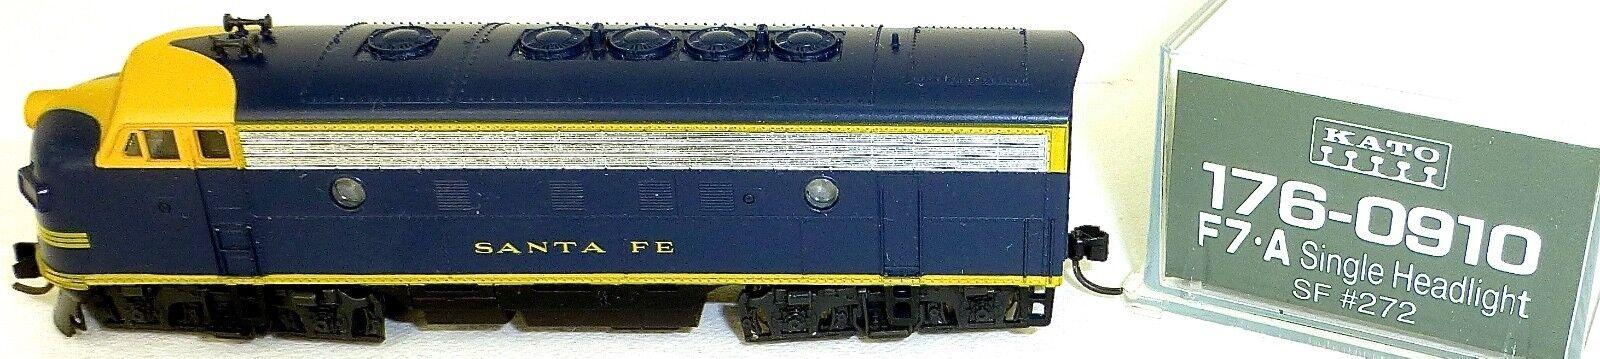 KATO 176-0910 F7A Santa Fe SF 272 Diesellok Single Headlight OVP N 1 160 HS5 å